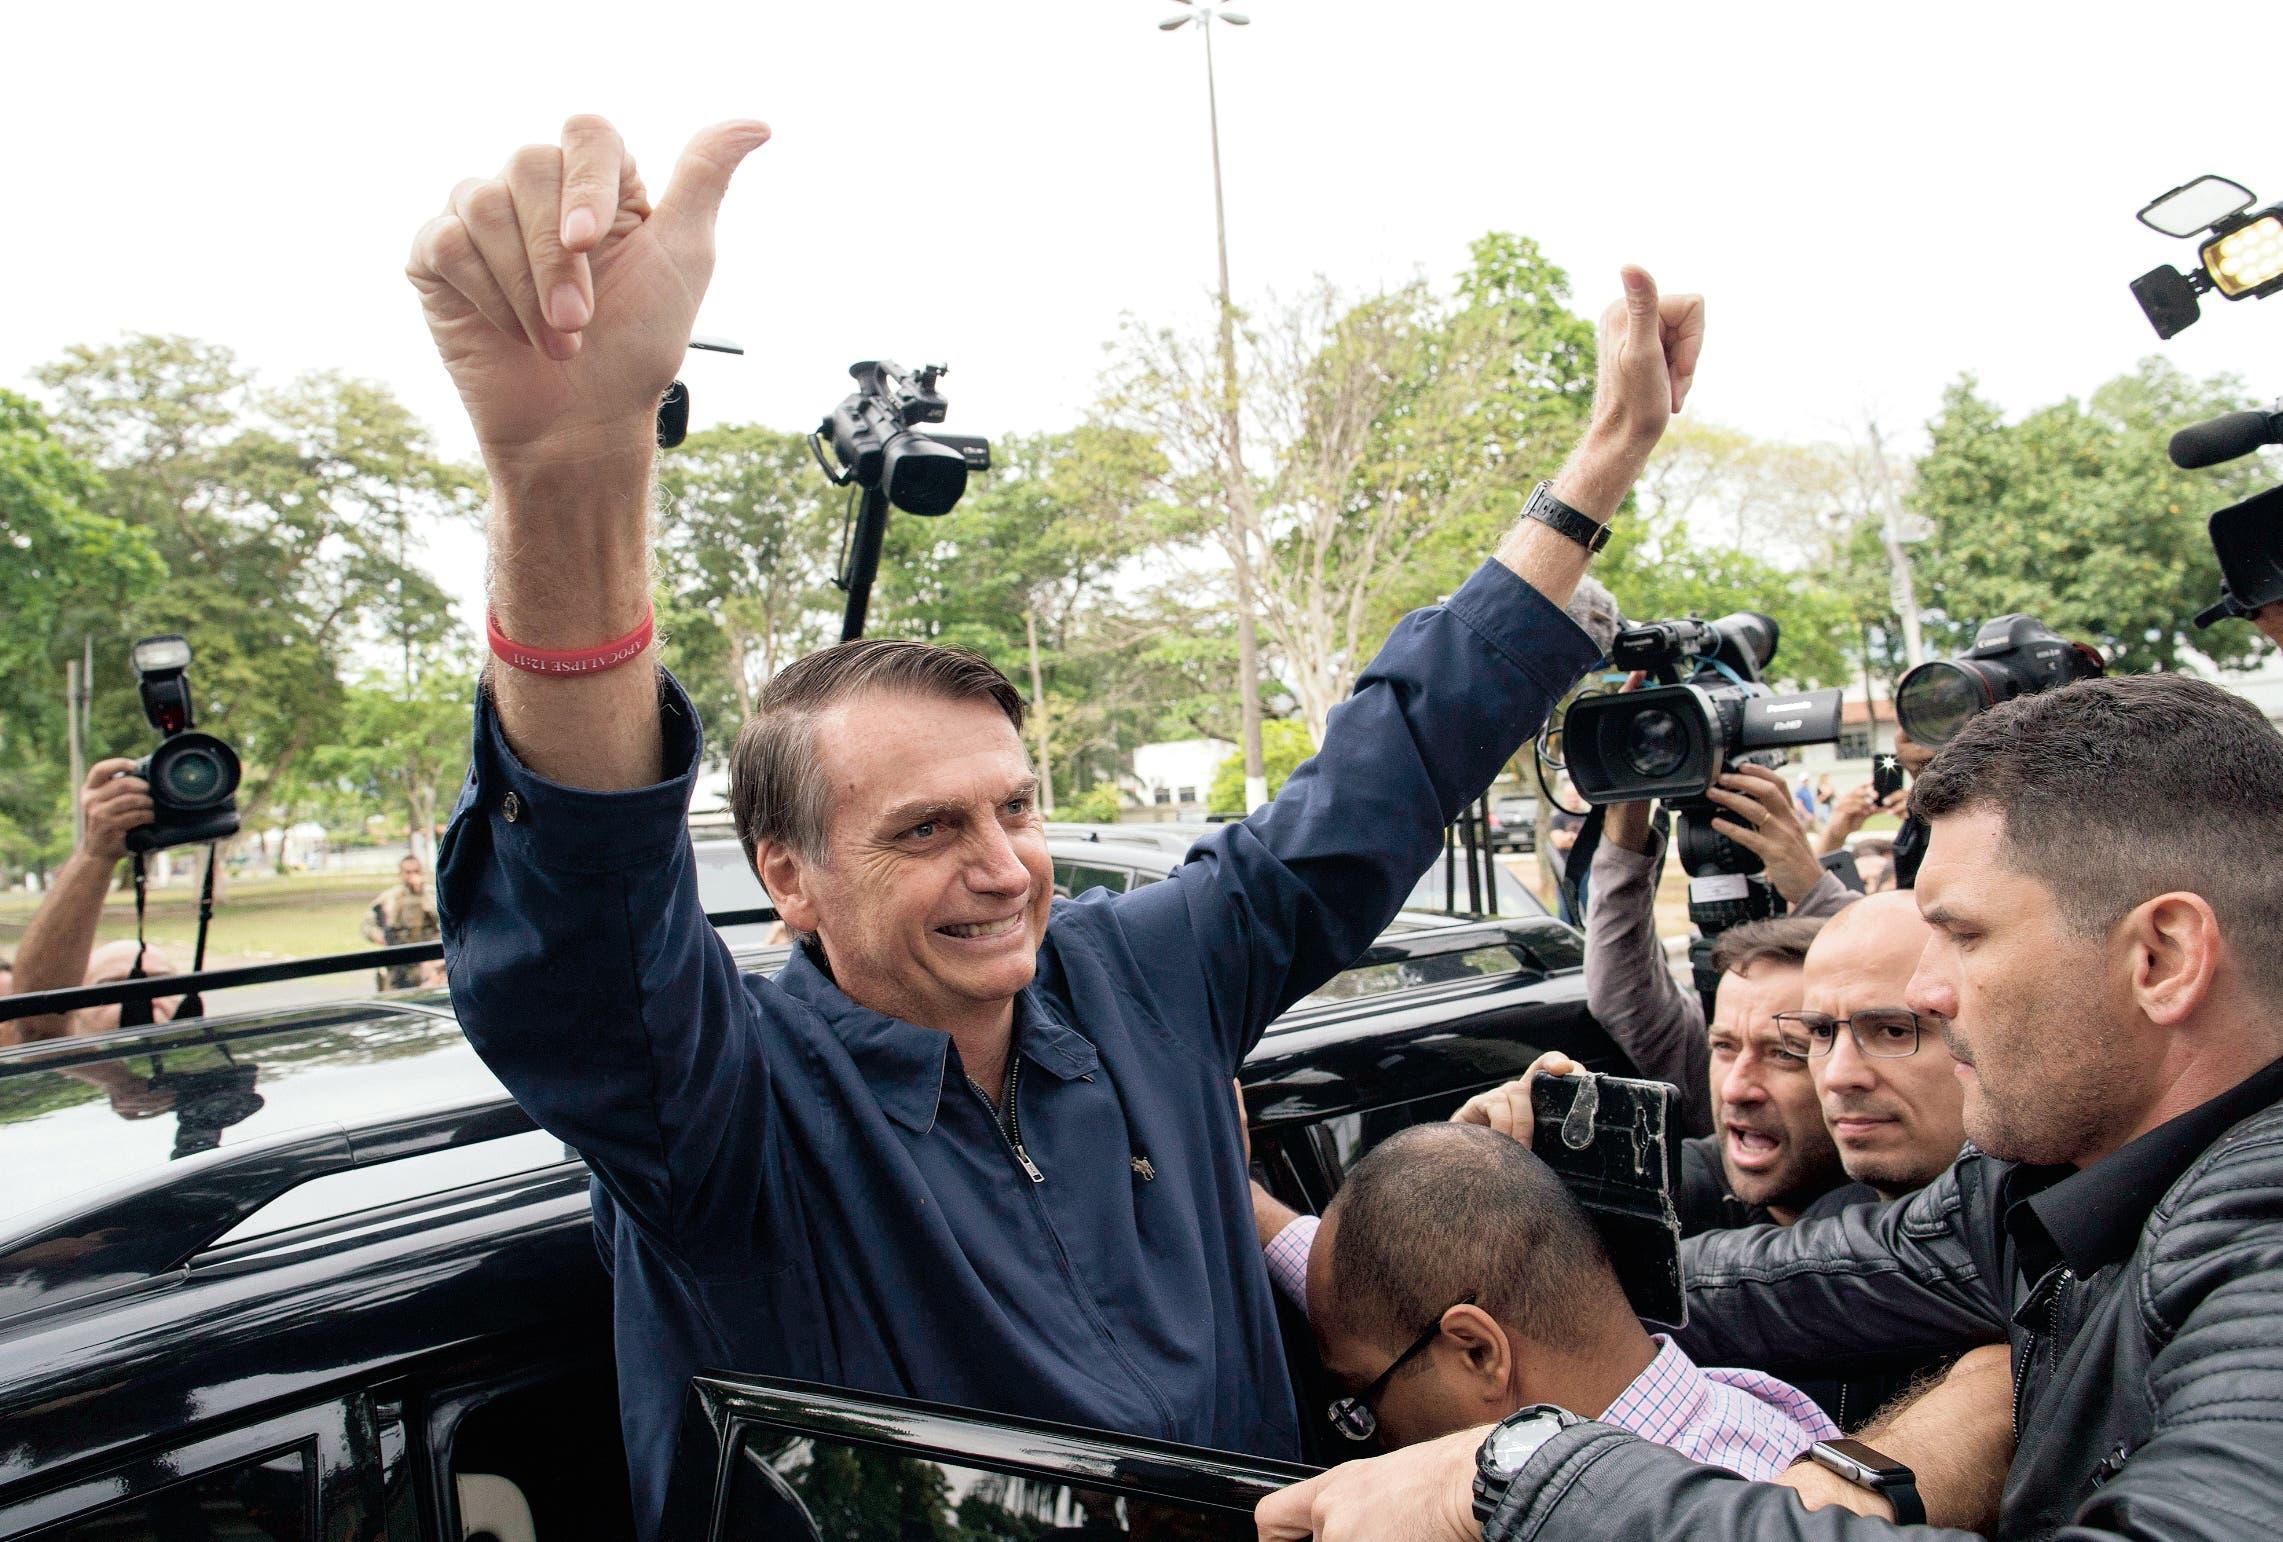 Reverendo Paulino Moya analiza causas de respaldo evangélico a ultraconservador Jair  Bolsonaro